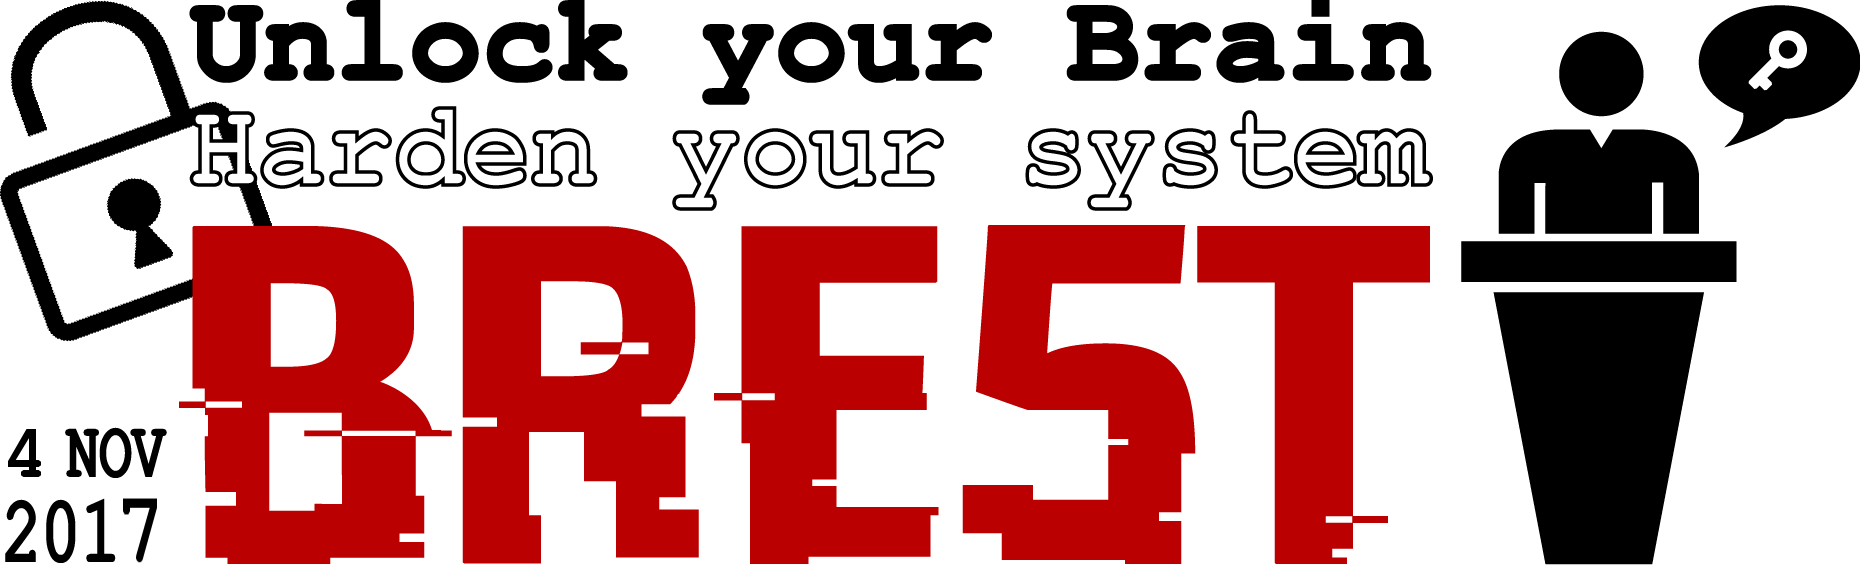 Conférence Unlock Your Brain, Harden Your System @ Bâtiment BASSAM | Brest | France